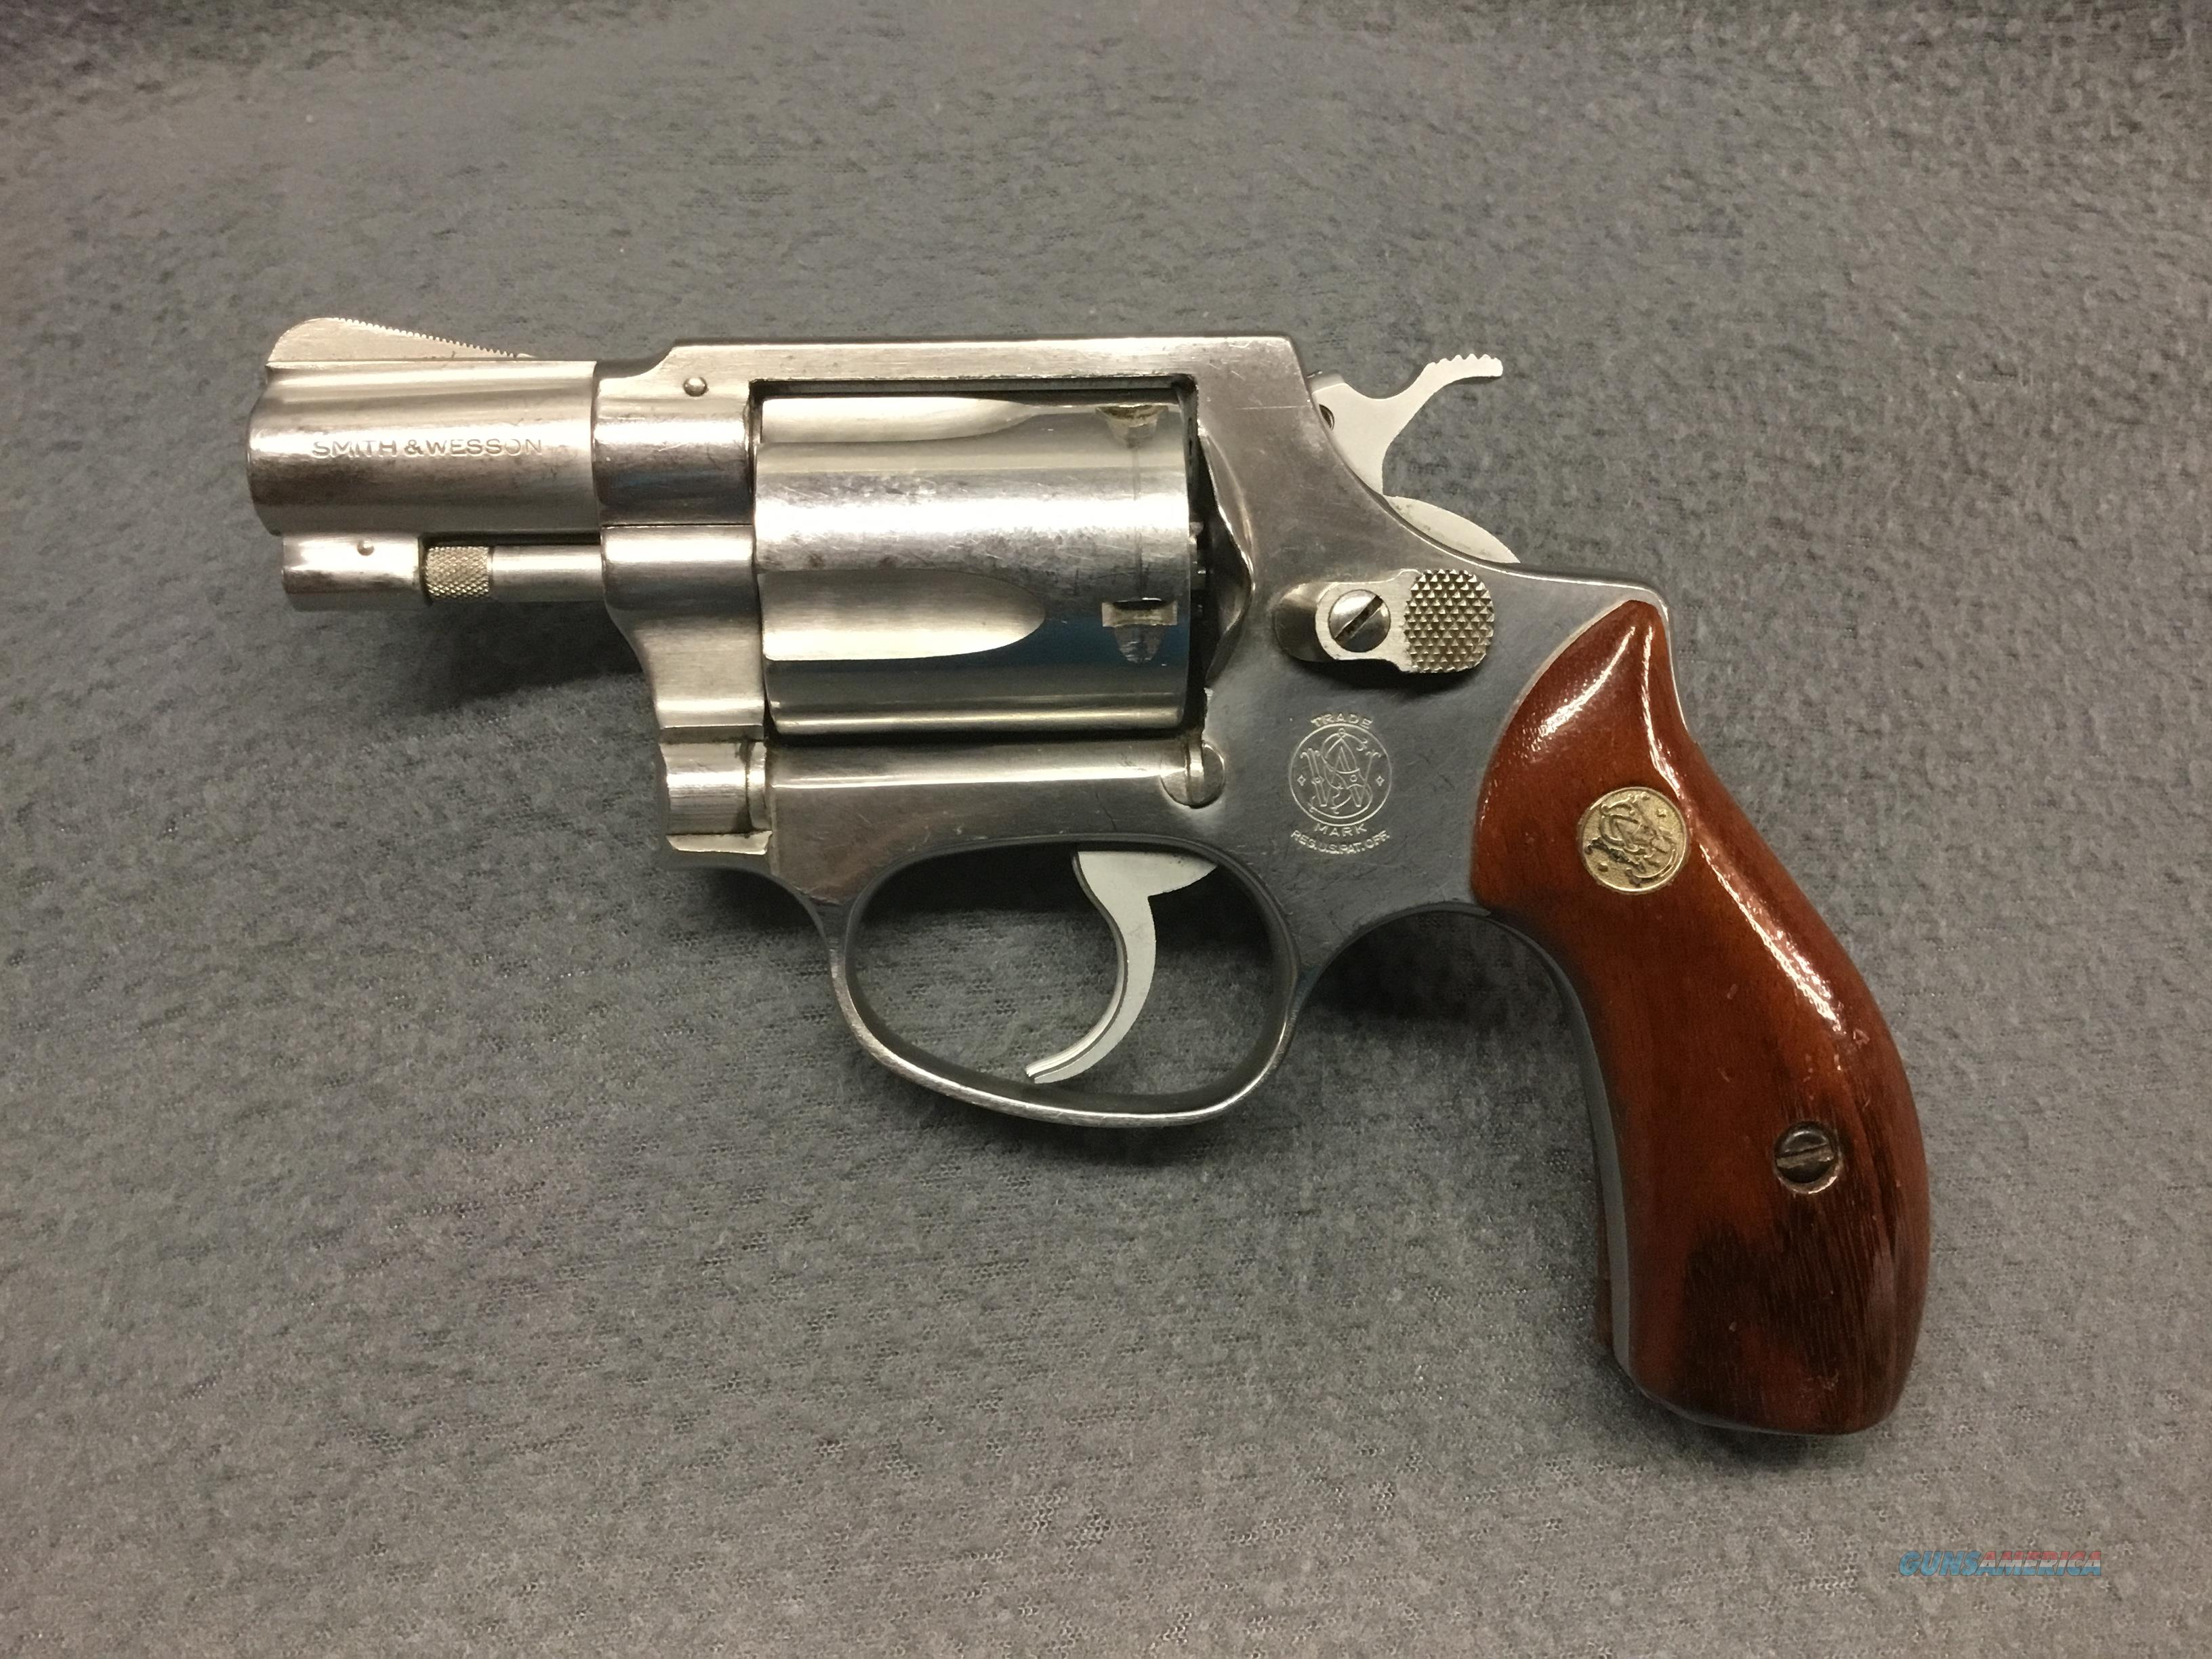 SMITH & WESSON  MODEL 60       NO DASH  Guns > Pistols > Smith & Wesson Revolvers > Pocket Pistols